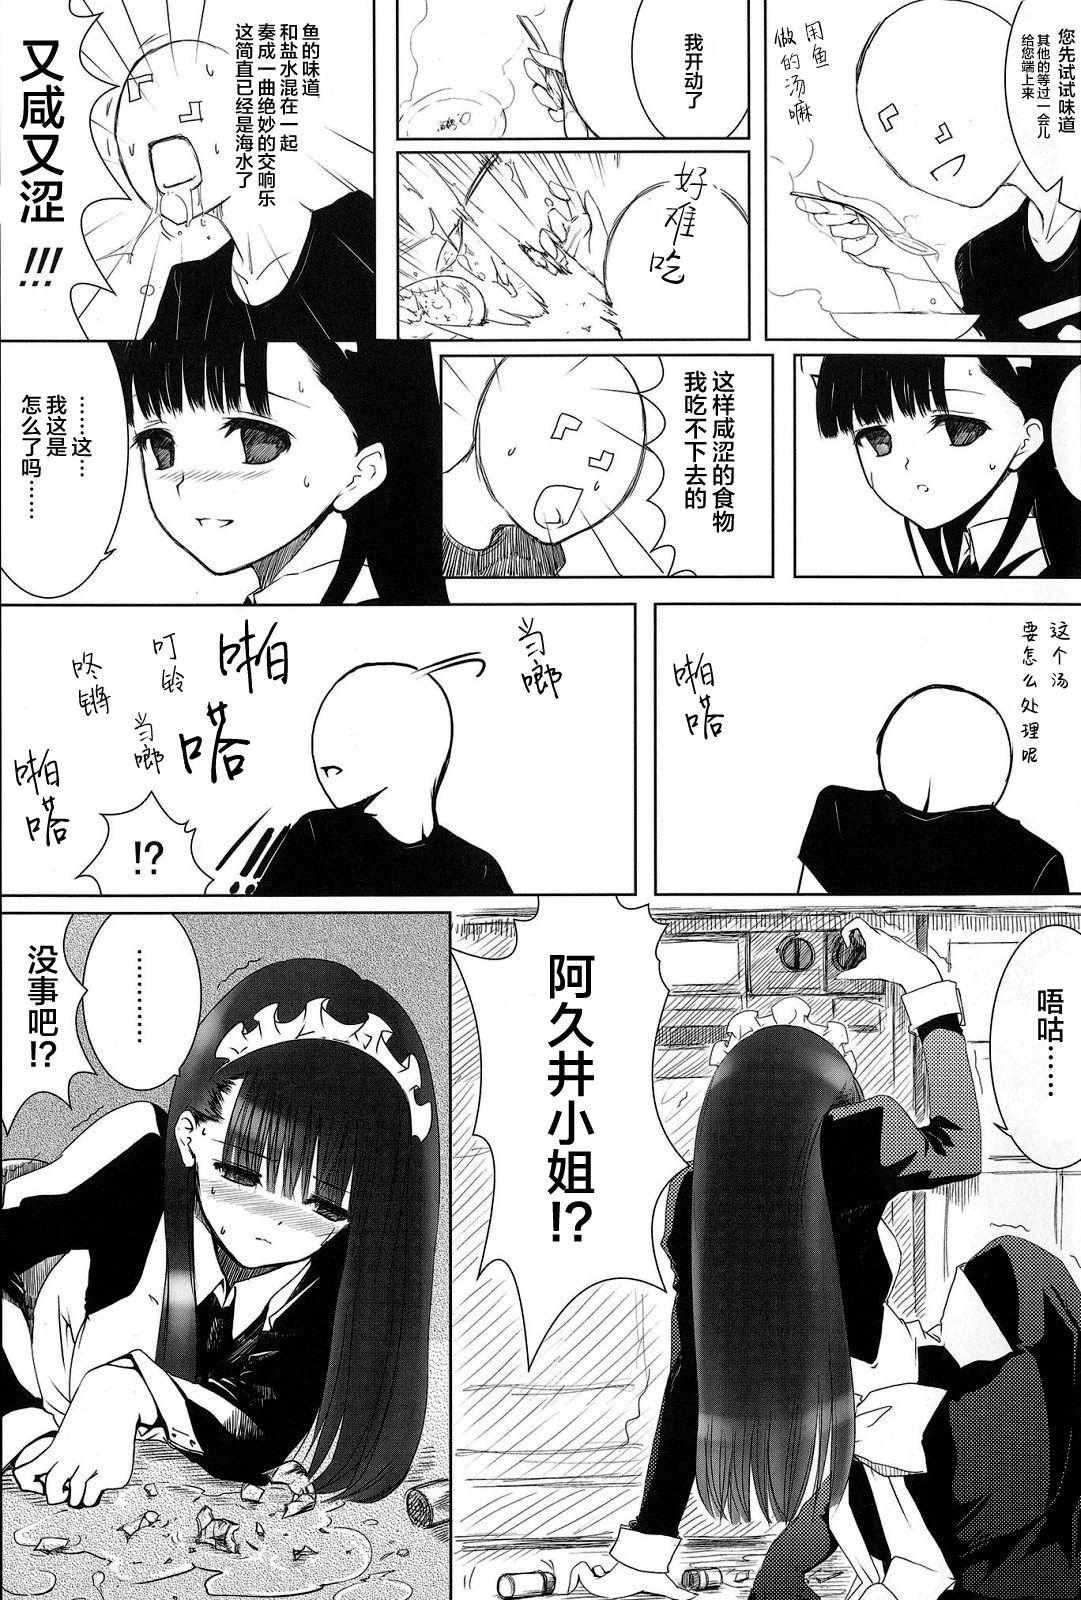 [Heikoushihenkei (Kawanakajima)] Akui-san ga Kaze hi-ta 1 | 阿九井小姐得了感冒1 [Chinese] [lolipoi汉化组] [2014-06-10] 6